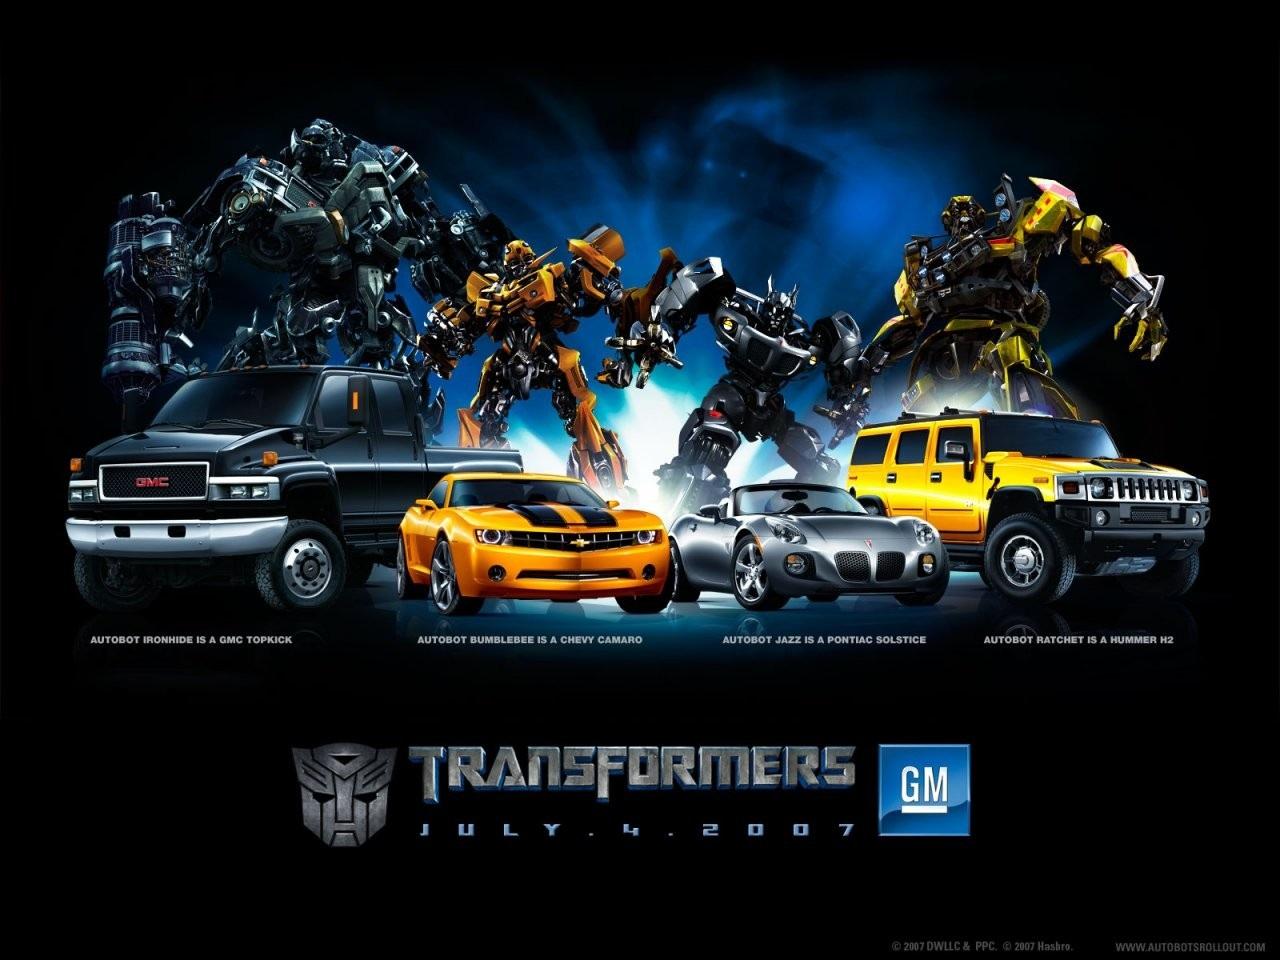 http://1.bp.blogspot.com/-TZBQvZRdDmY/Tf-aNjq1A8I/AAAAAAAAAbw/zqqyac3SGqA/s1600/transformers-autobots-wallpaper.jpg